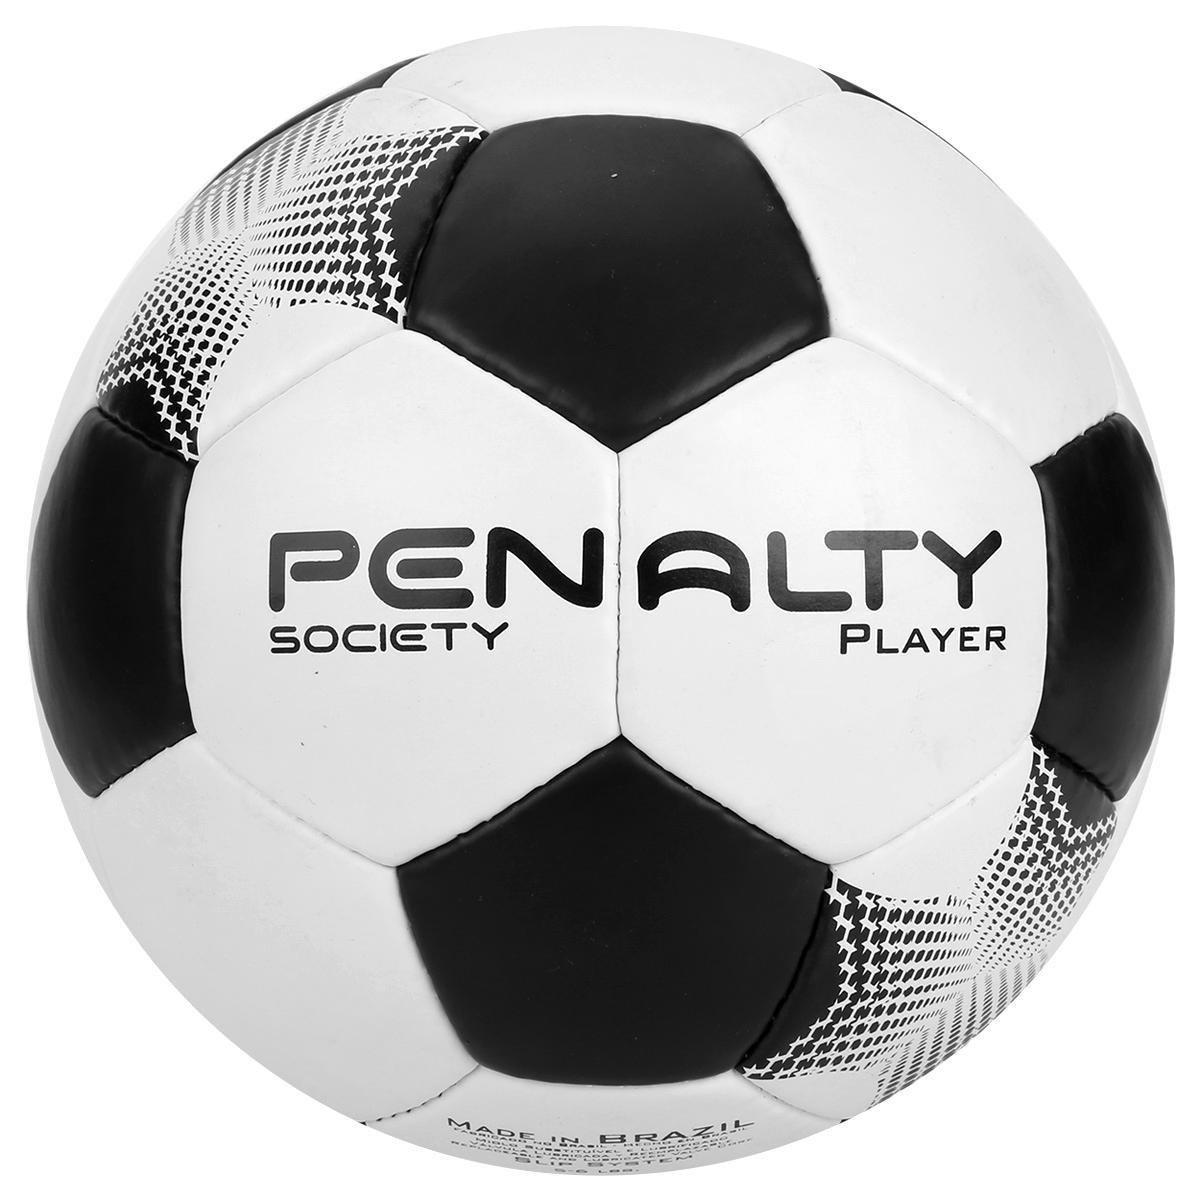 b4a25a926 Bola Futebol Society Penalty Player 7 - Compre Agora